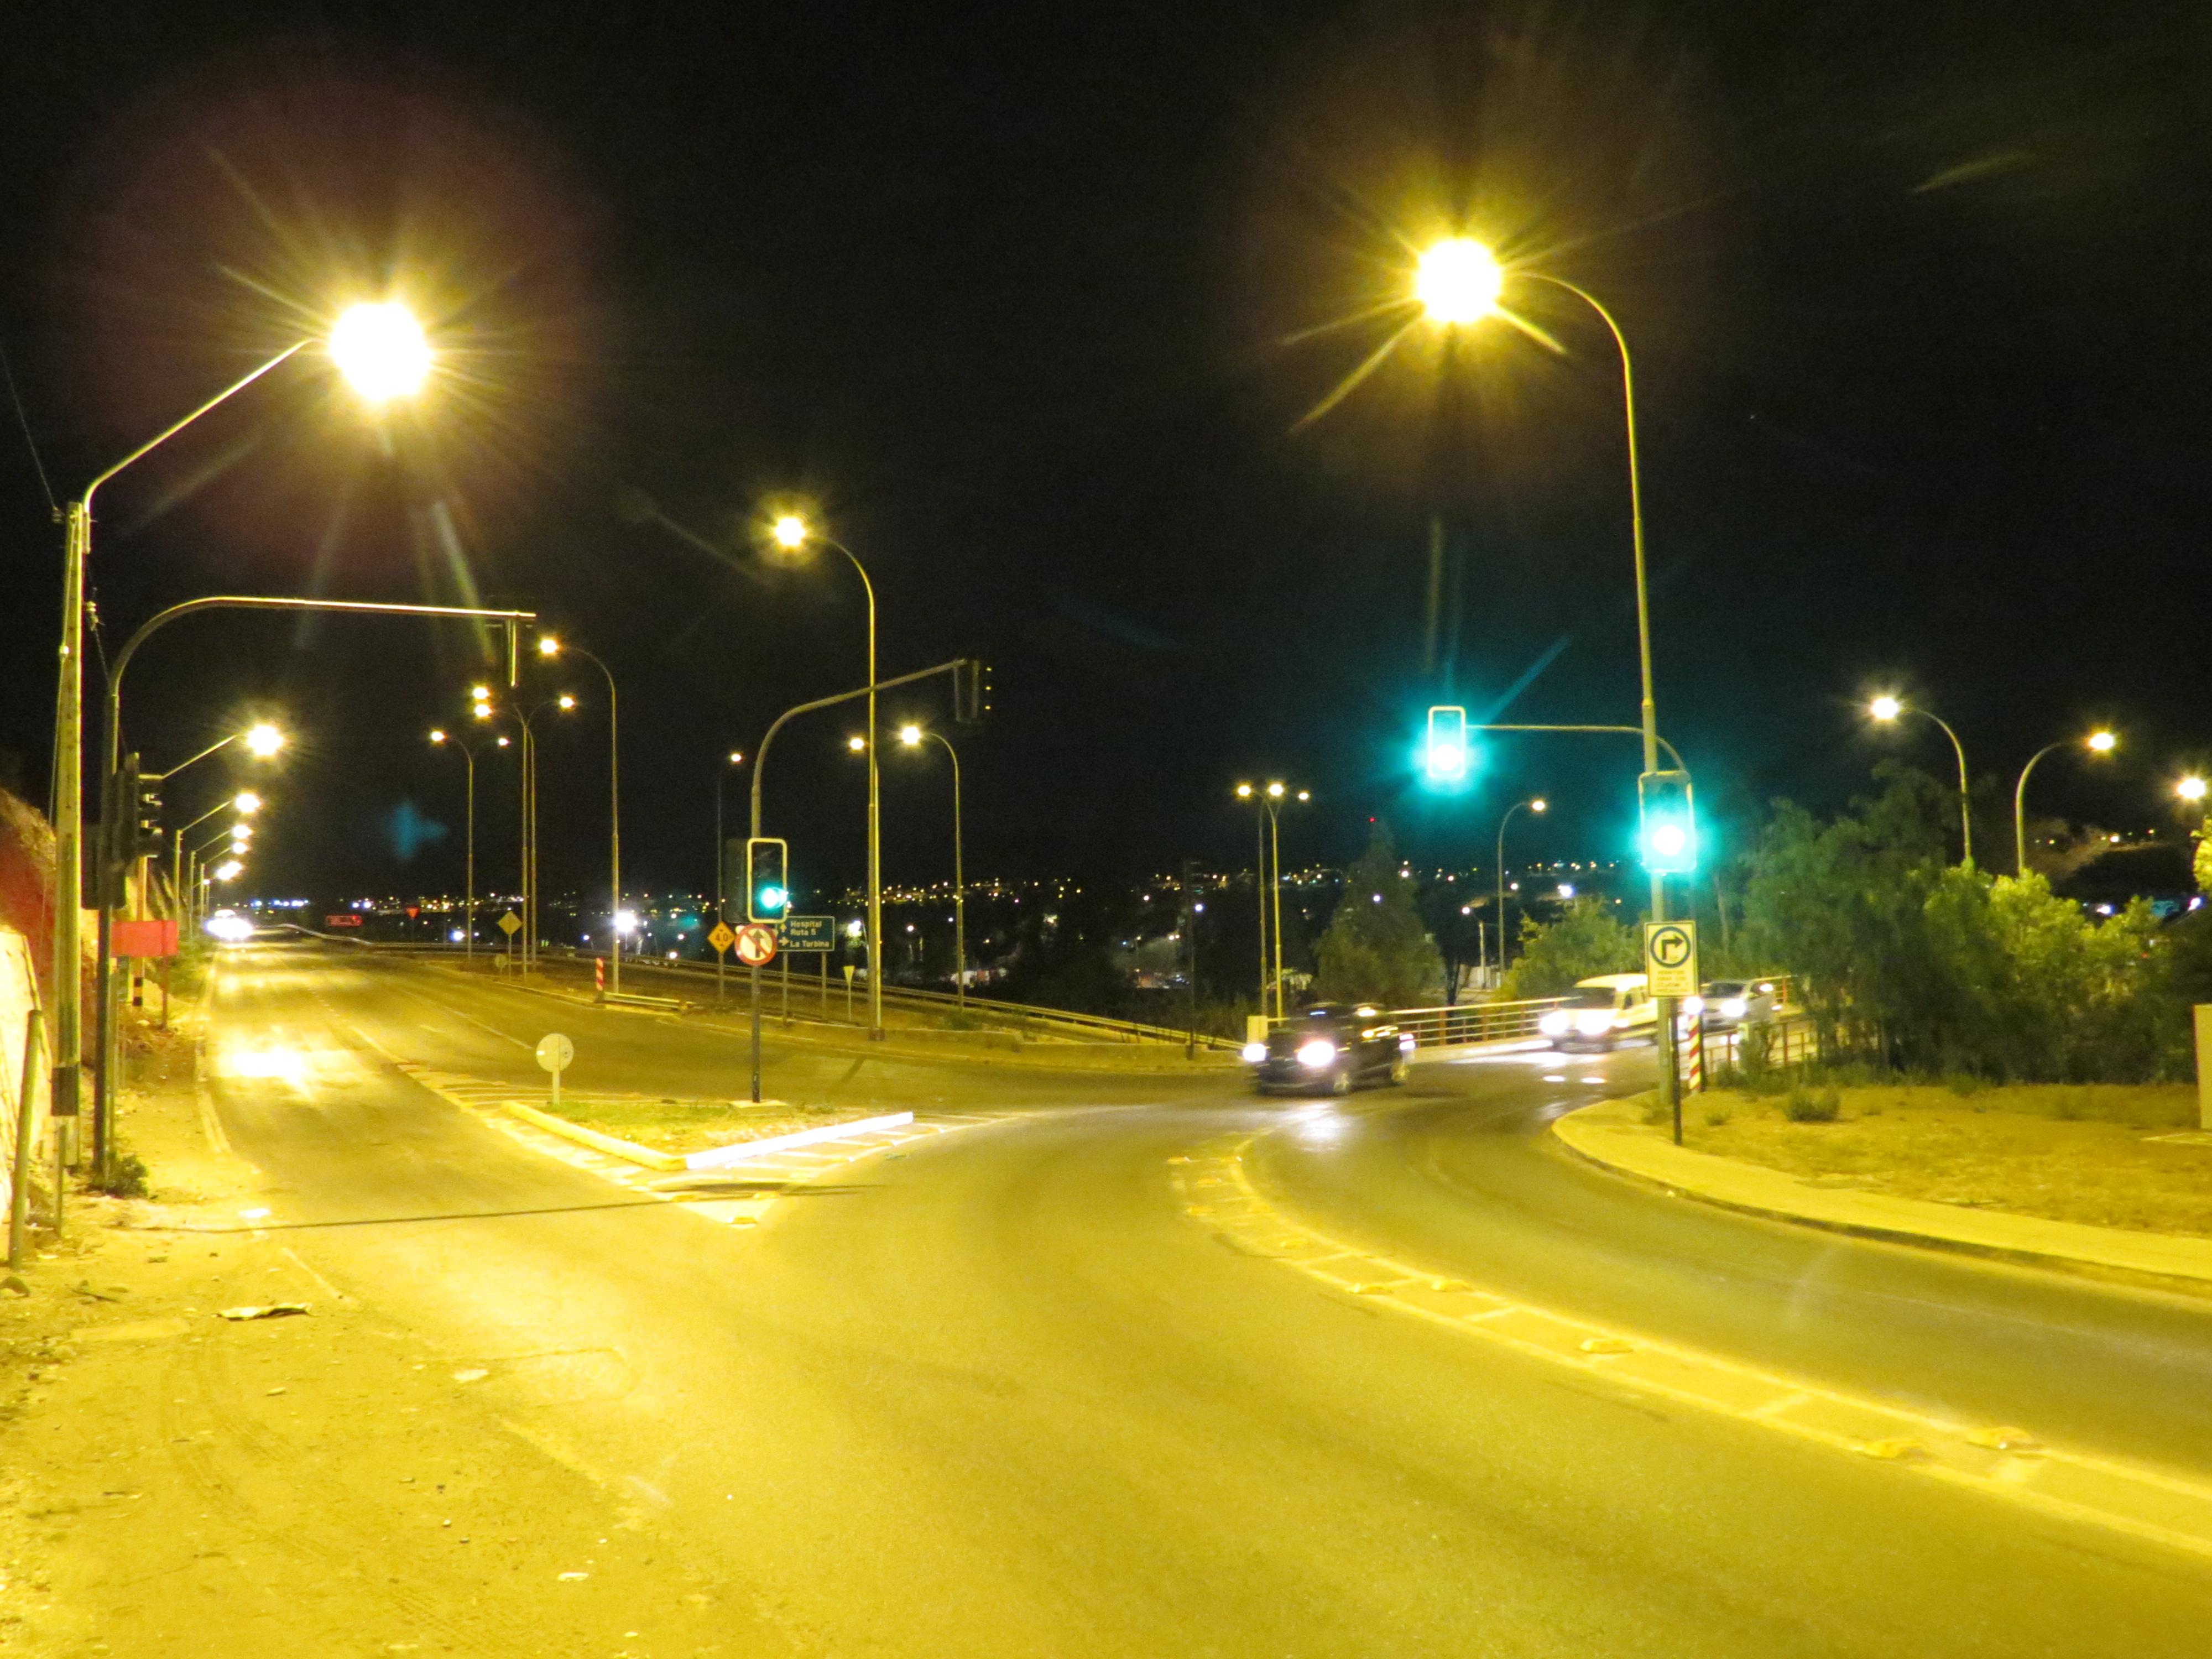 Municipio realiza reparación de semáforos en mal estado